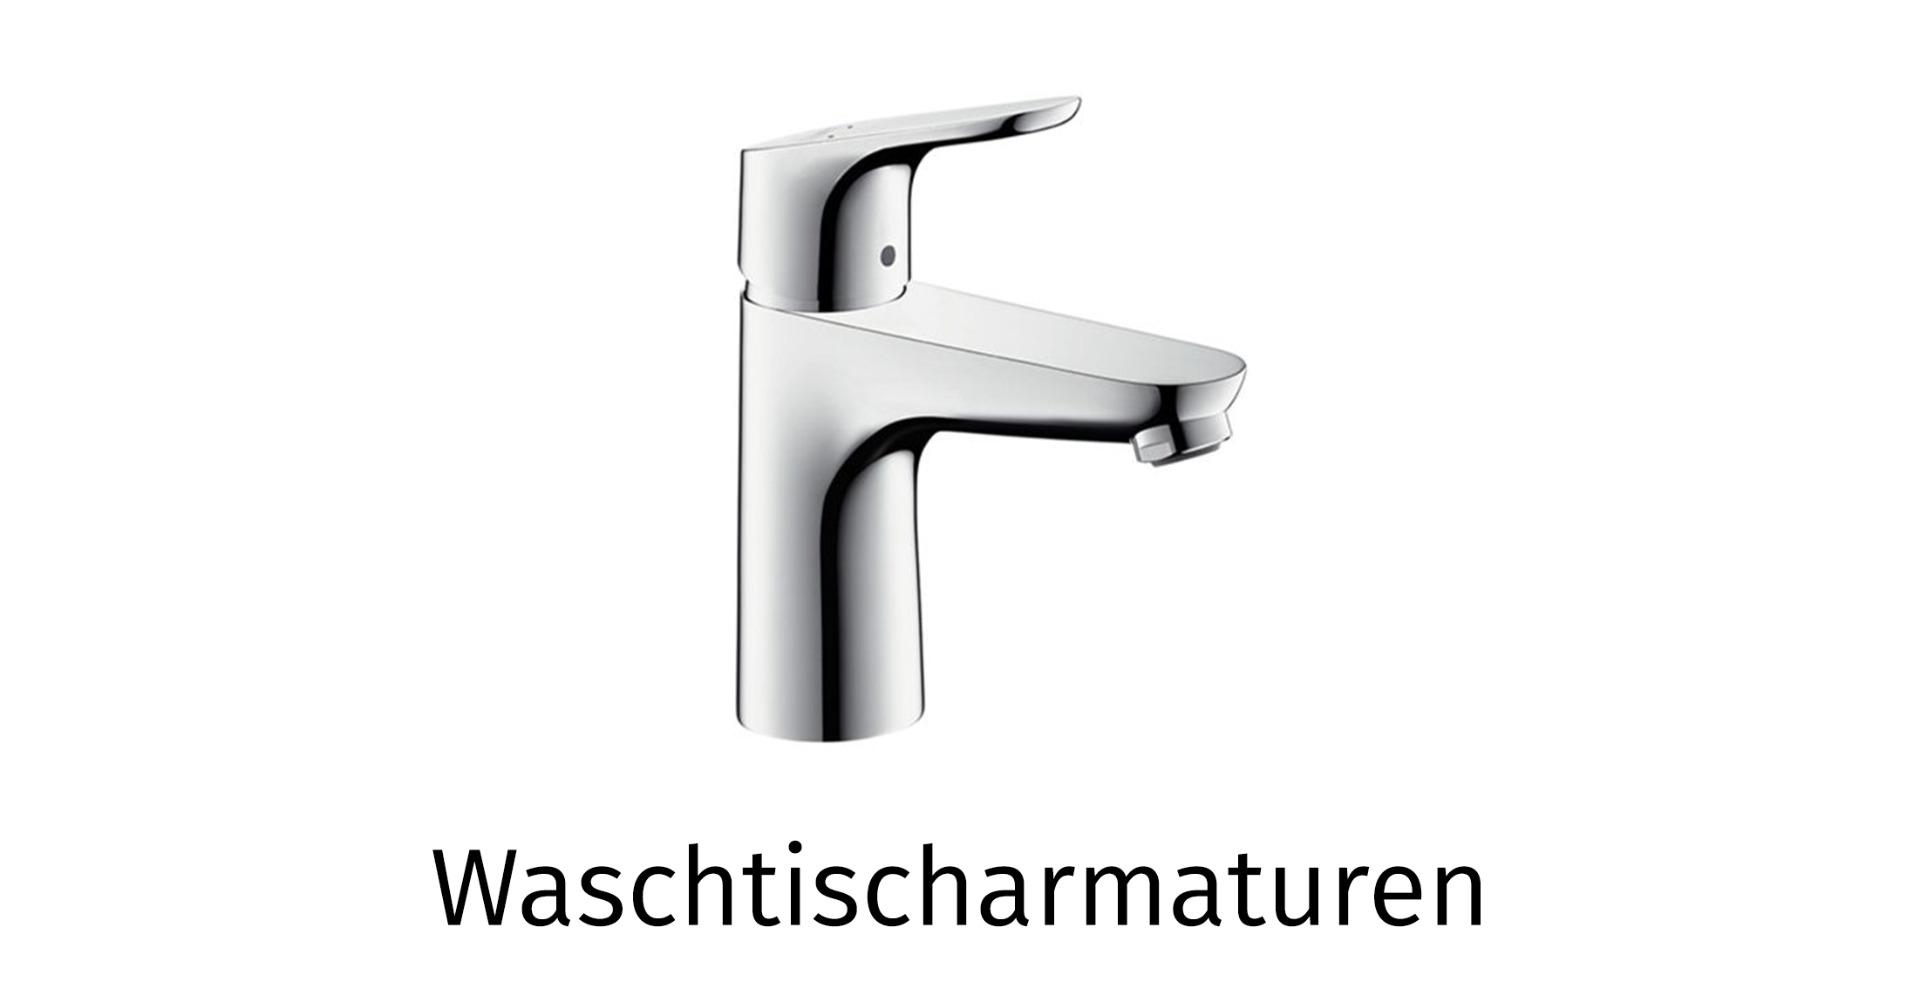 Waschtischarmatur